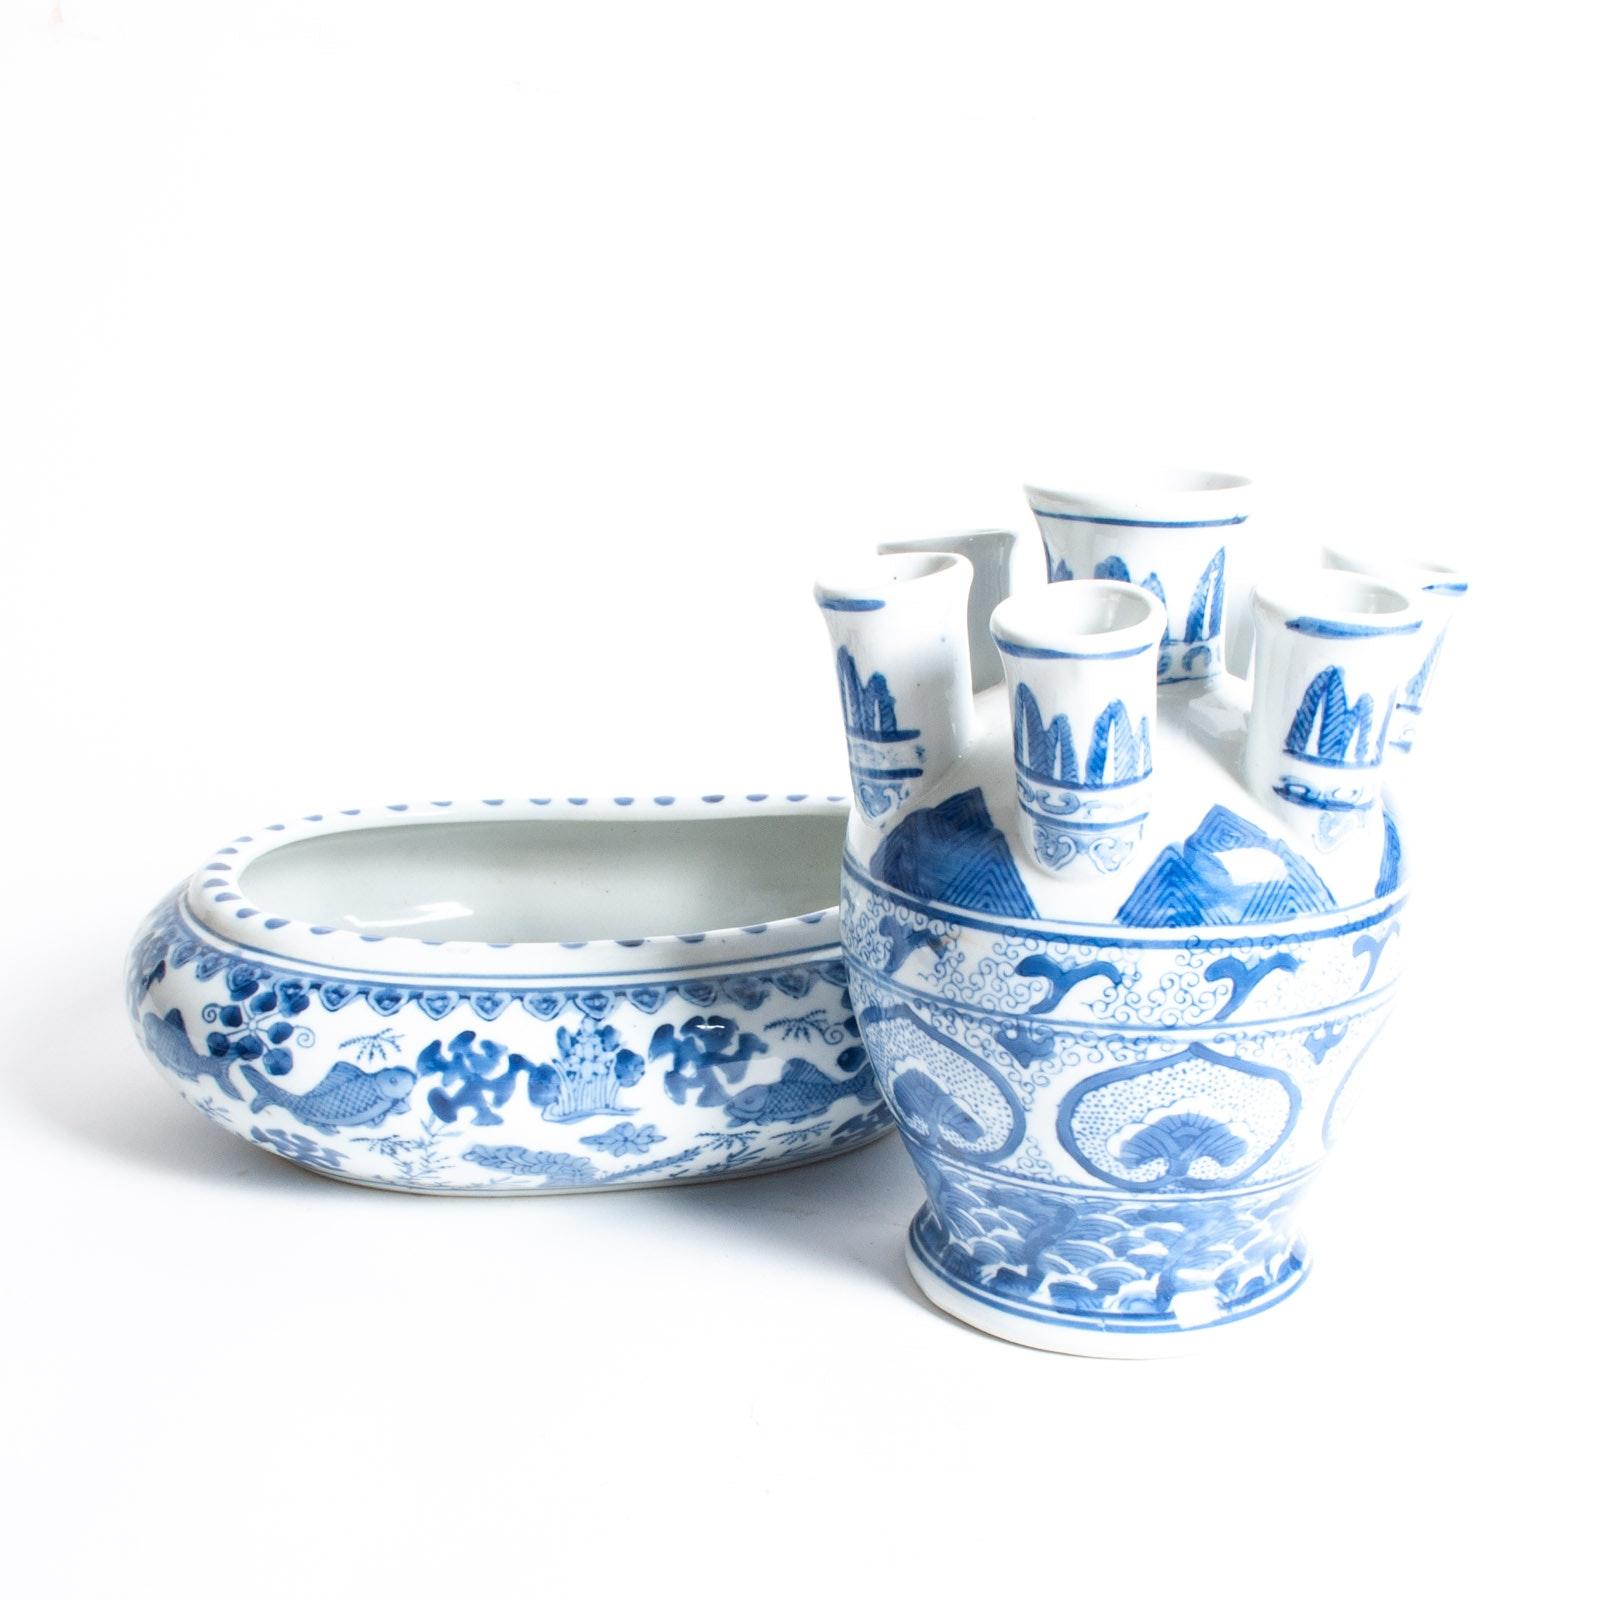 Blue on White Porcelain Tulipiere Vase and Fish Bowl Jardiniere